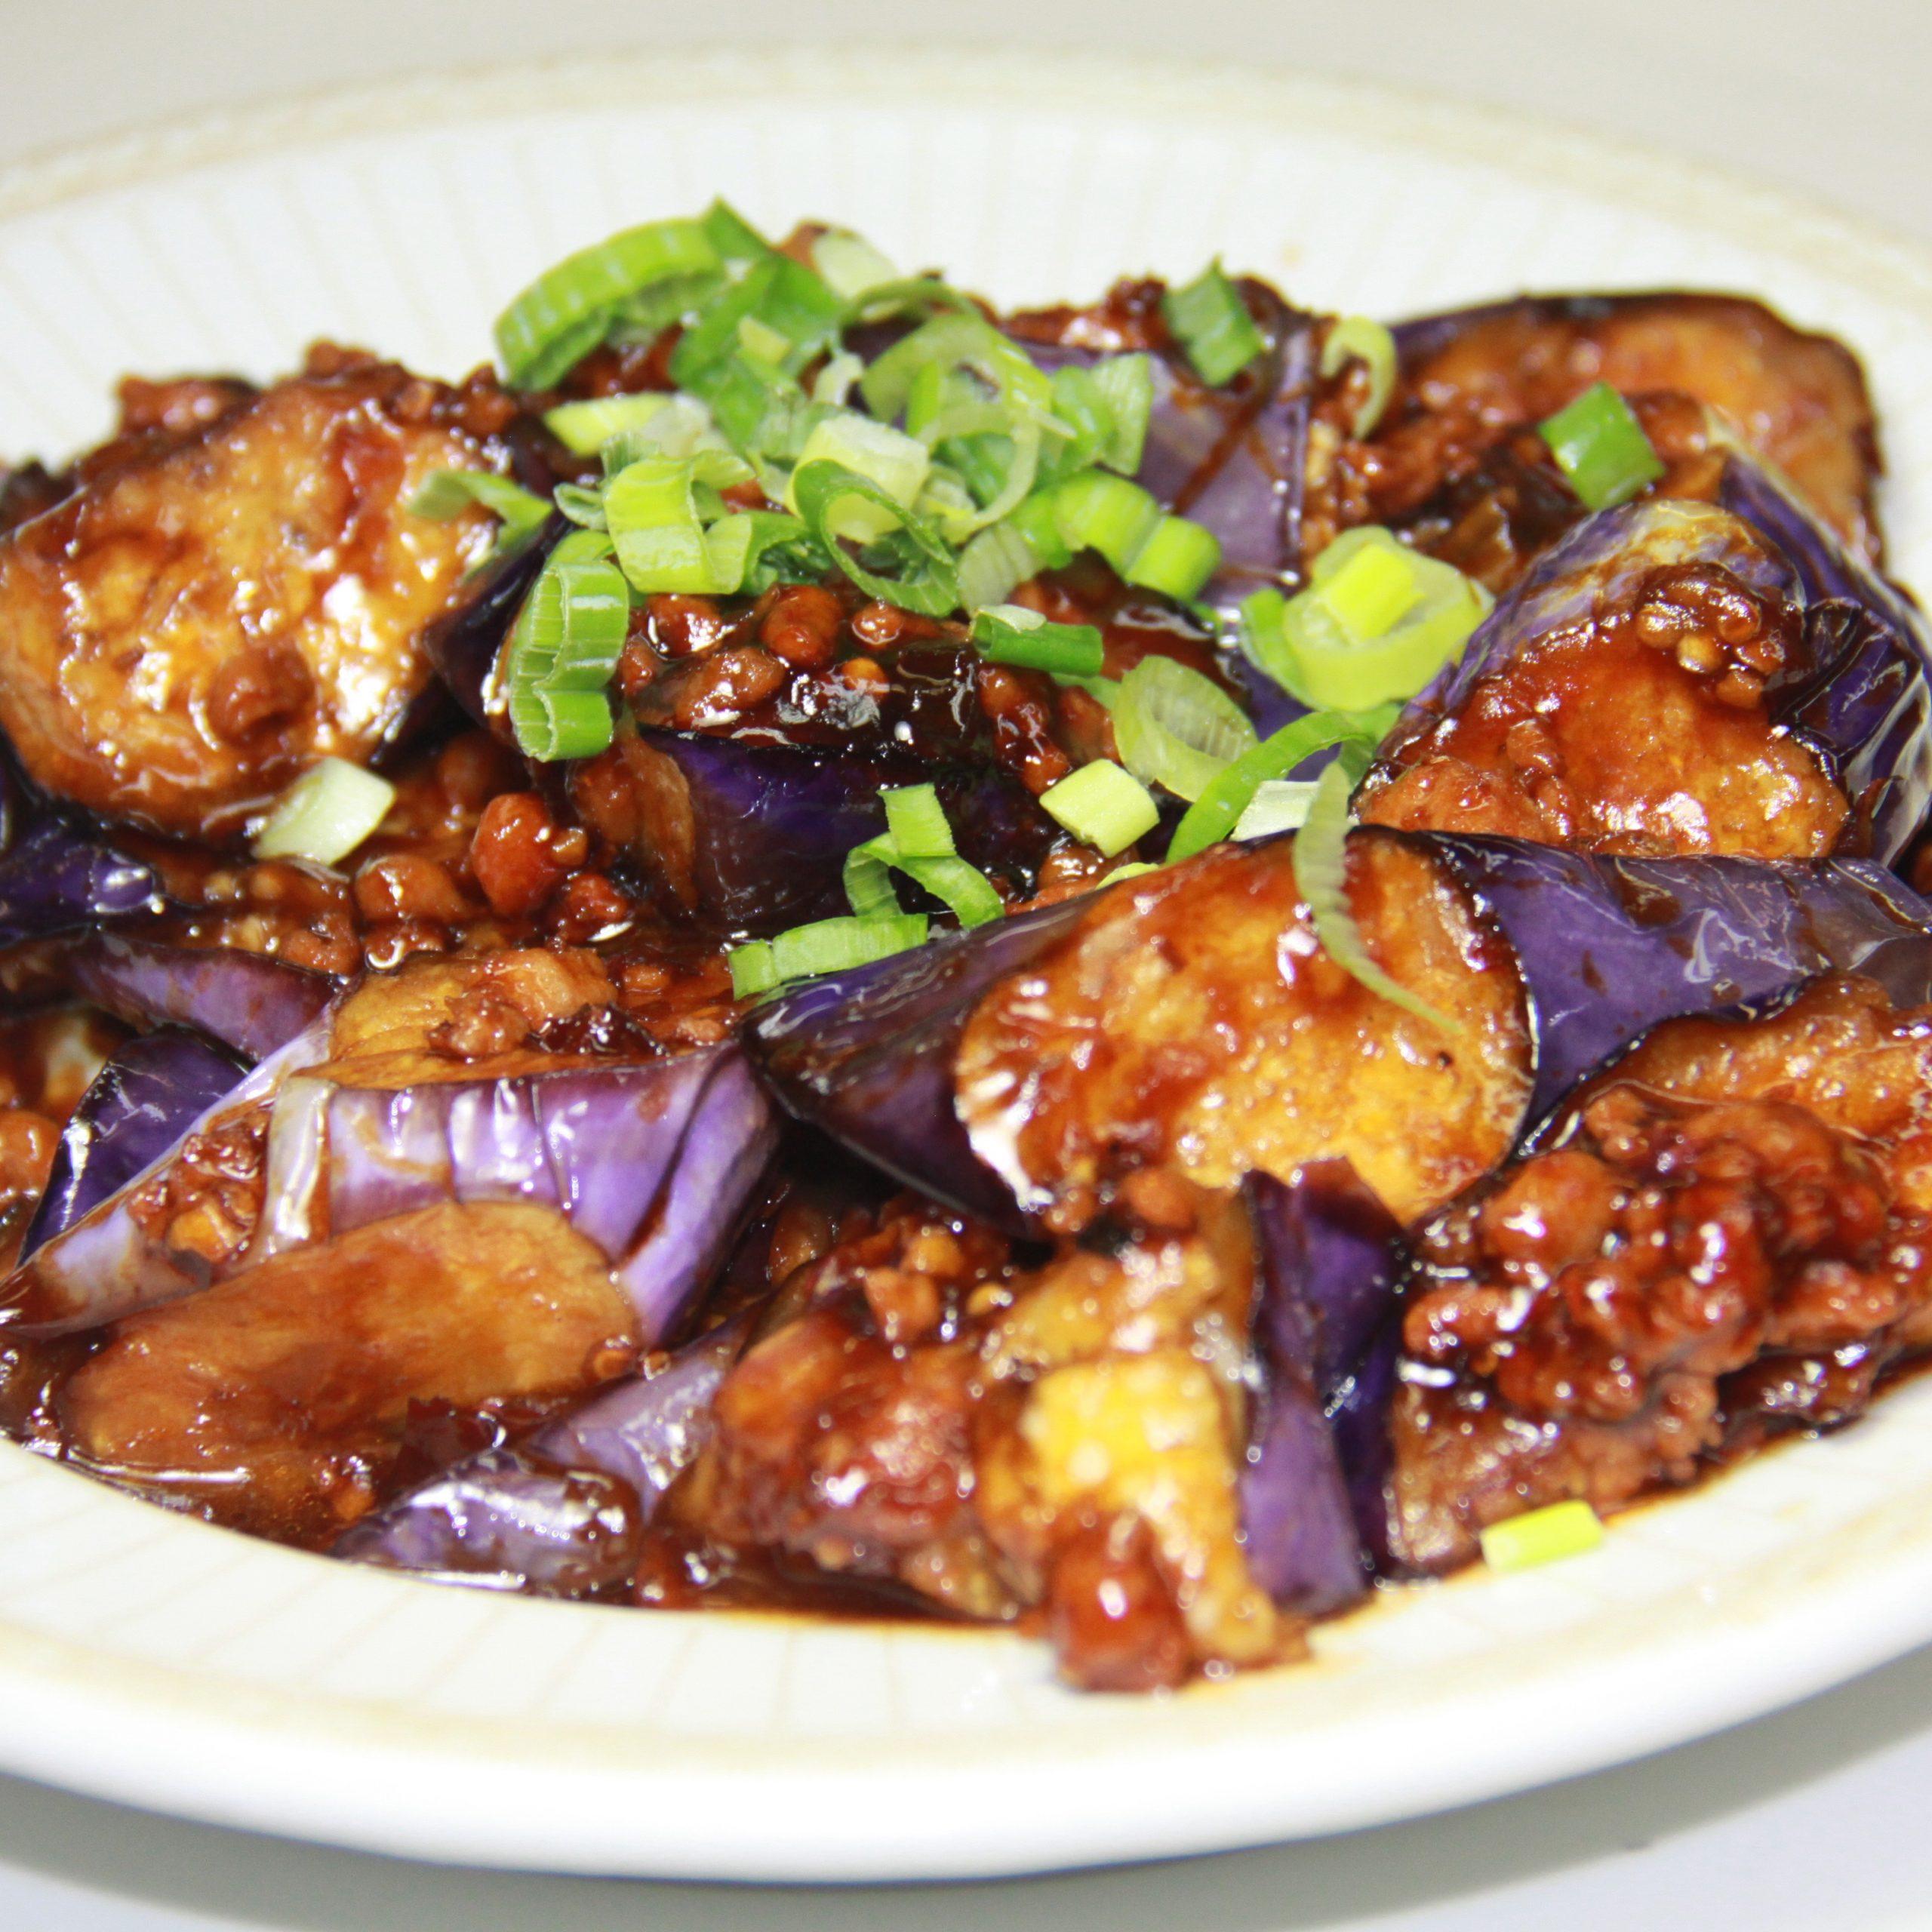 Eggplants in Chili Garlic Sauce(Pork)